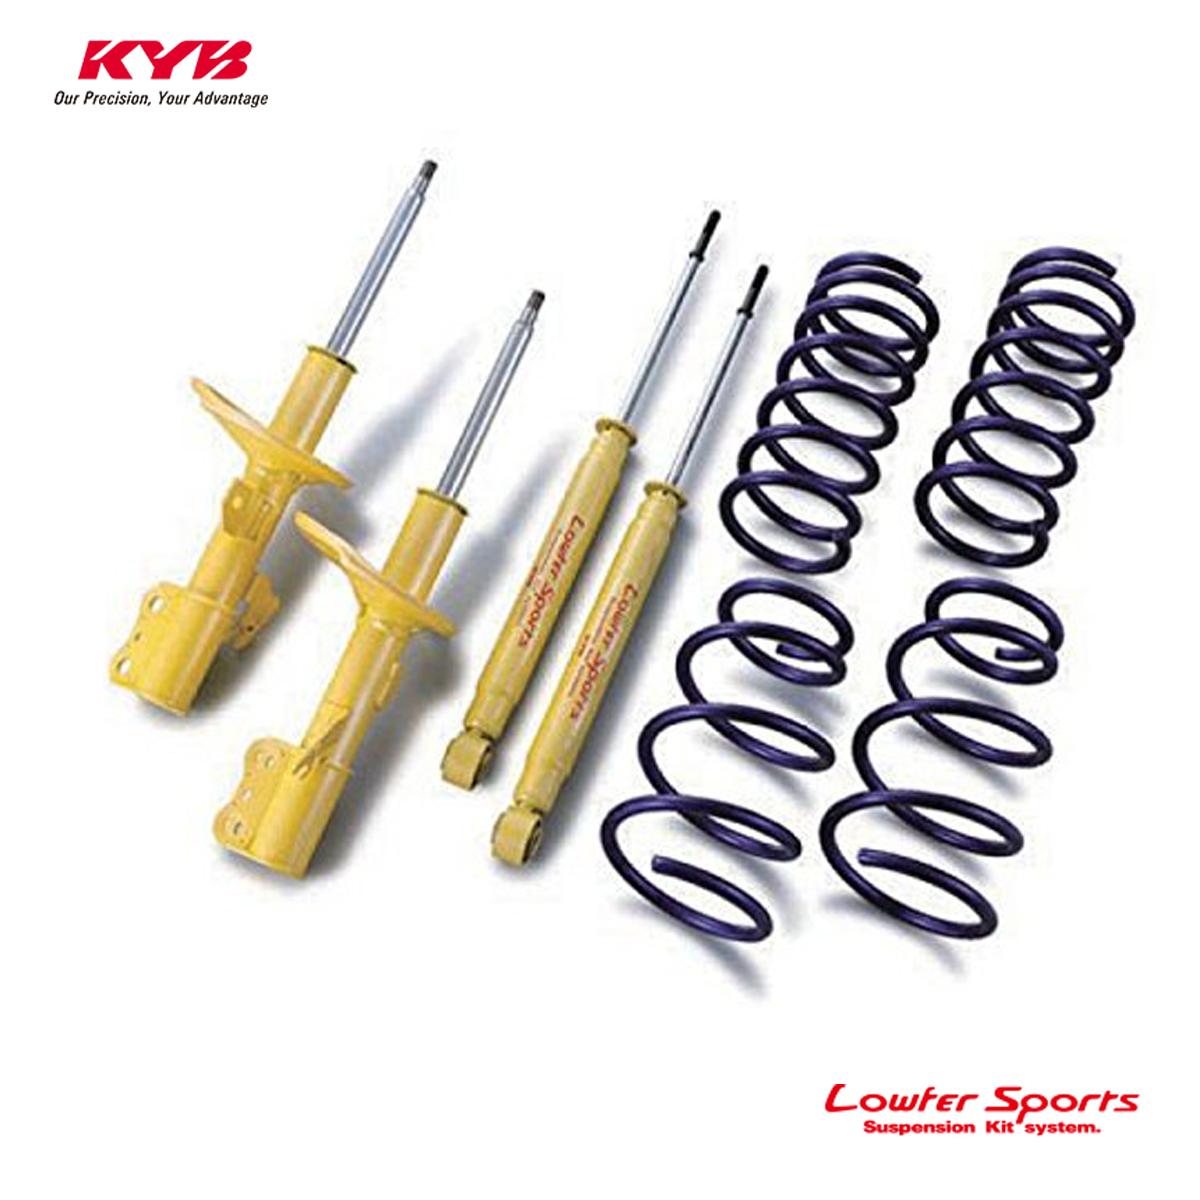 KYB カヤバ スイフトスポーツ ZC32S ショックアブソーバー サスペンションキット Lowfer Sports LKIT-ZC32S 配送先条件有り